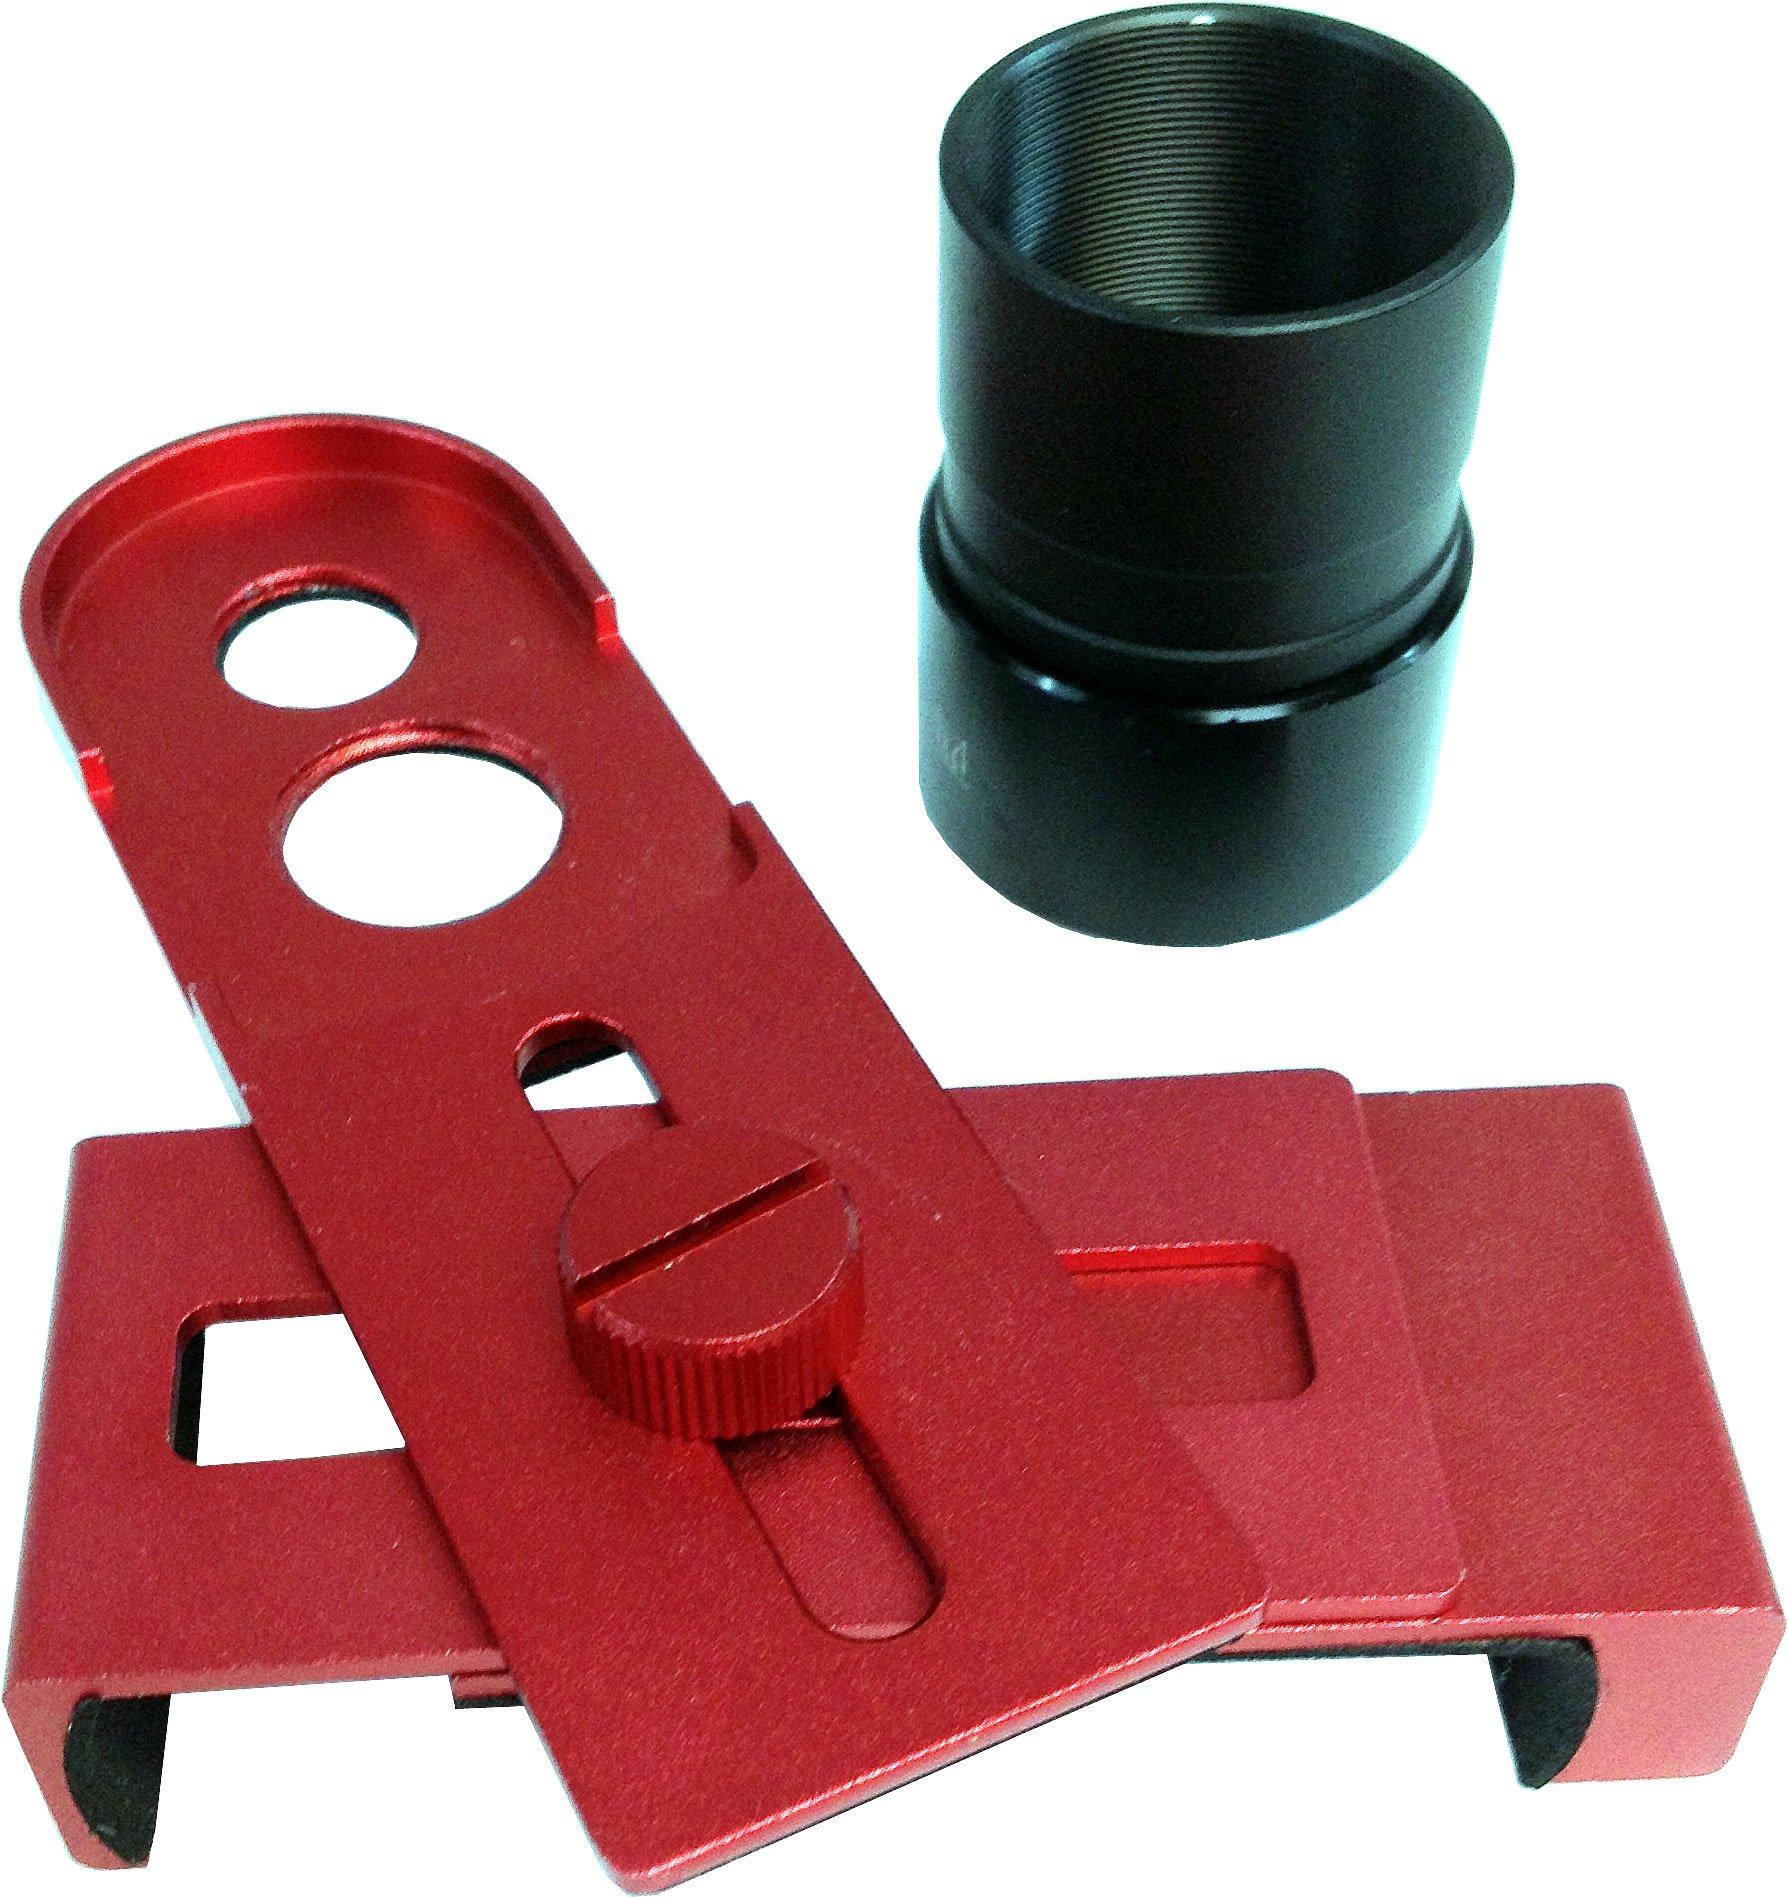 iOptron 8432 Universal Smartphone Eyepiece Adaptor (Red) by iOptron